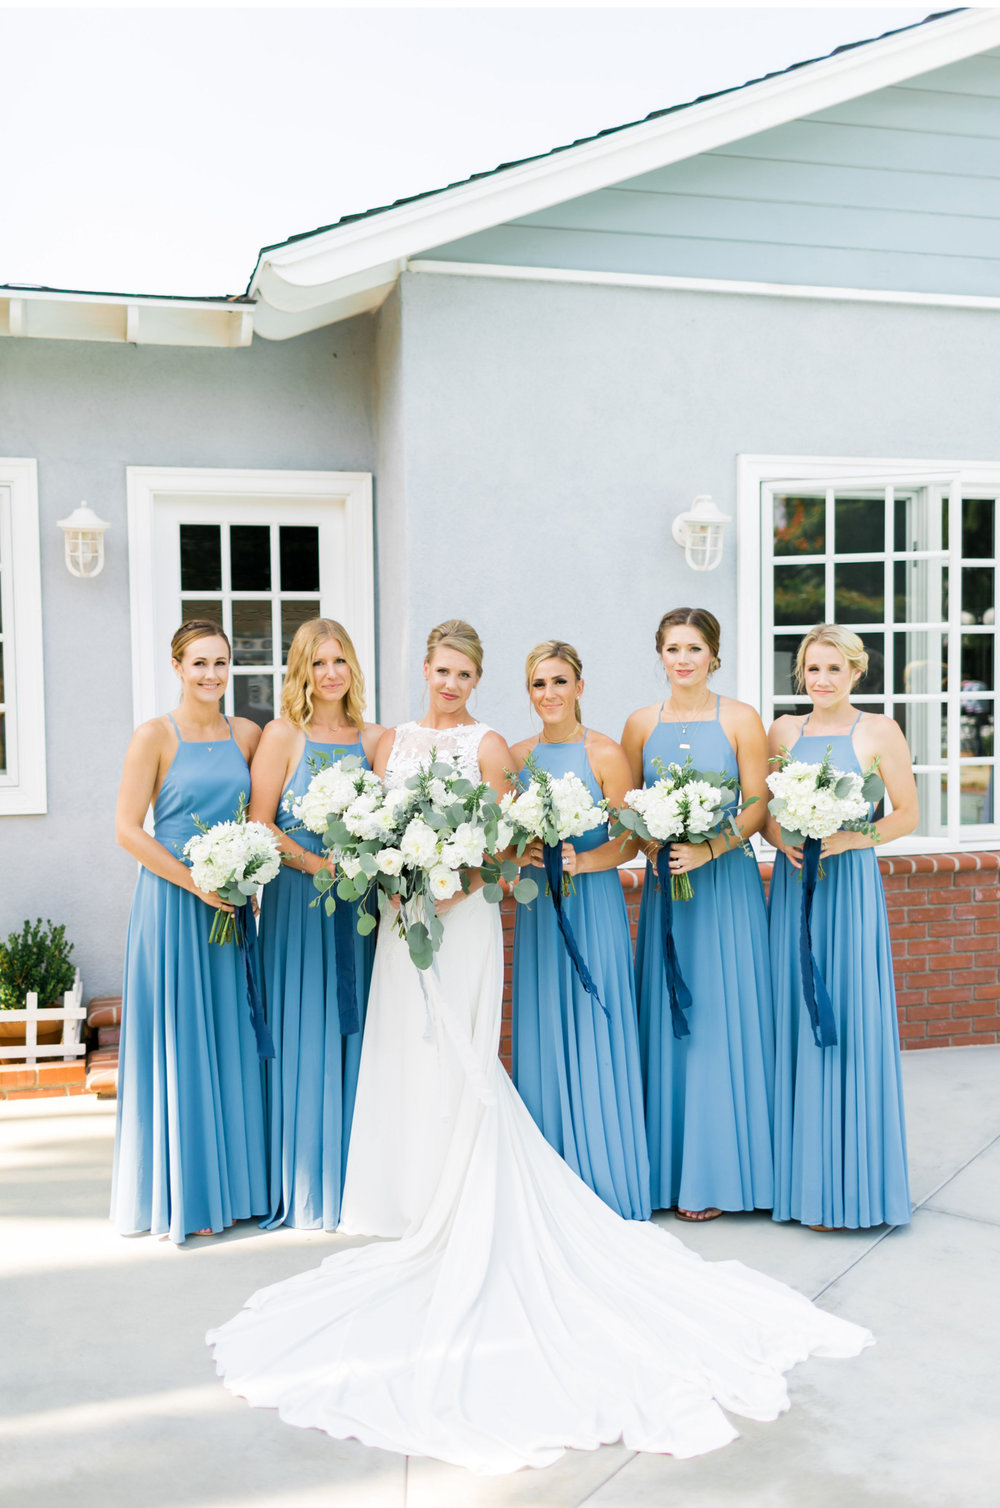 Southern-California-Wedding-Photographer-Natalie-Schutt-Photography_02.jpg